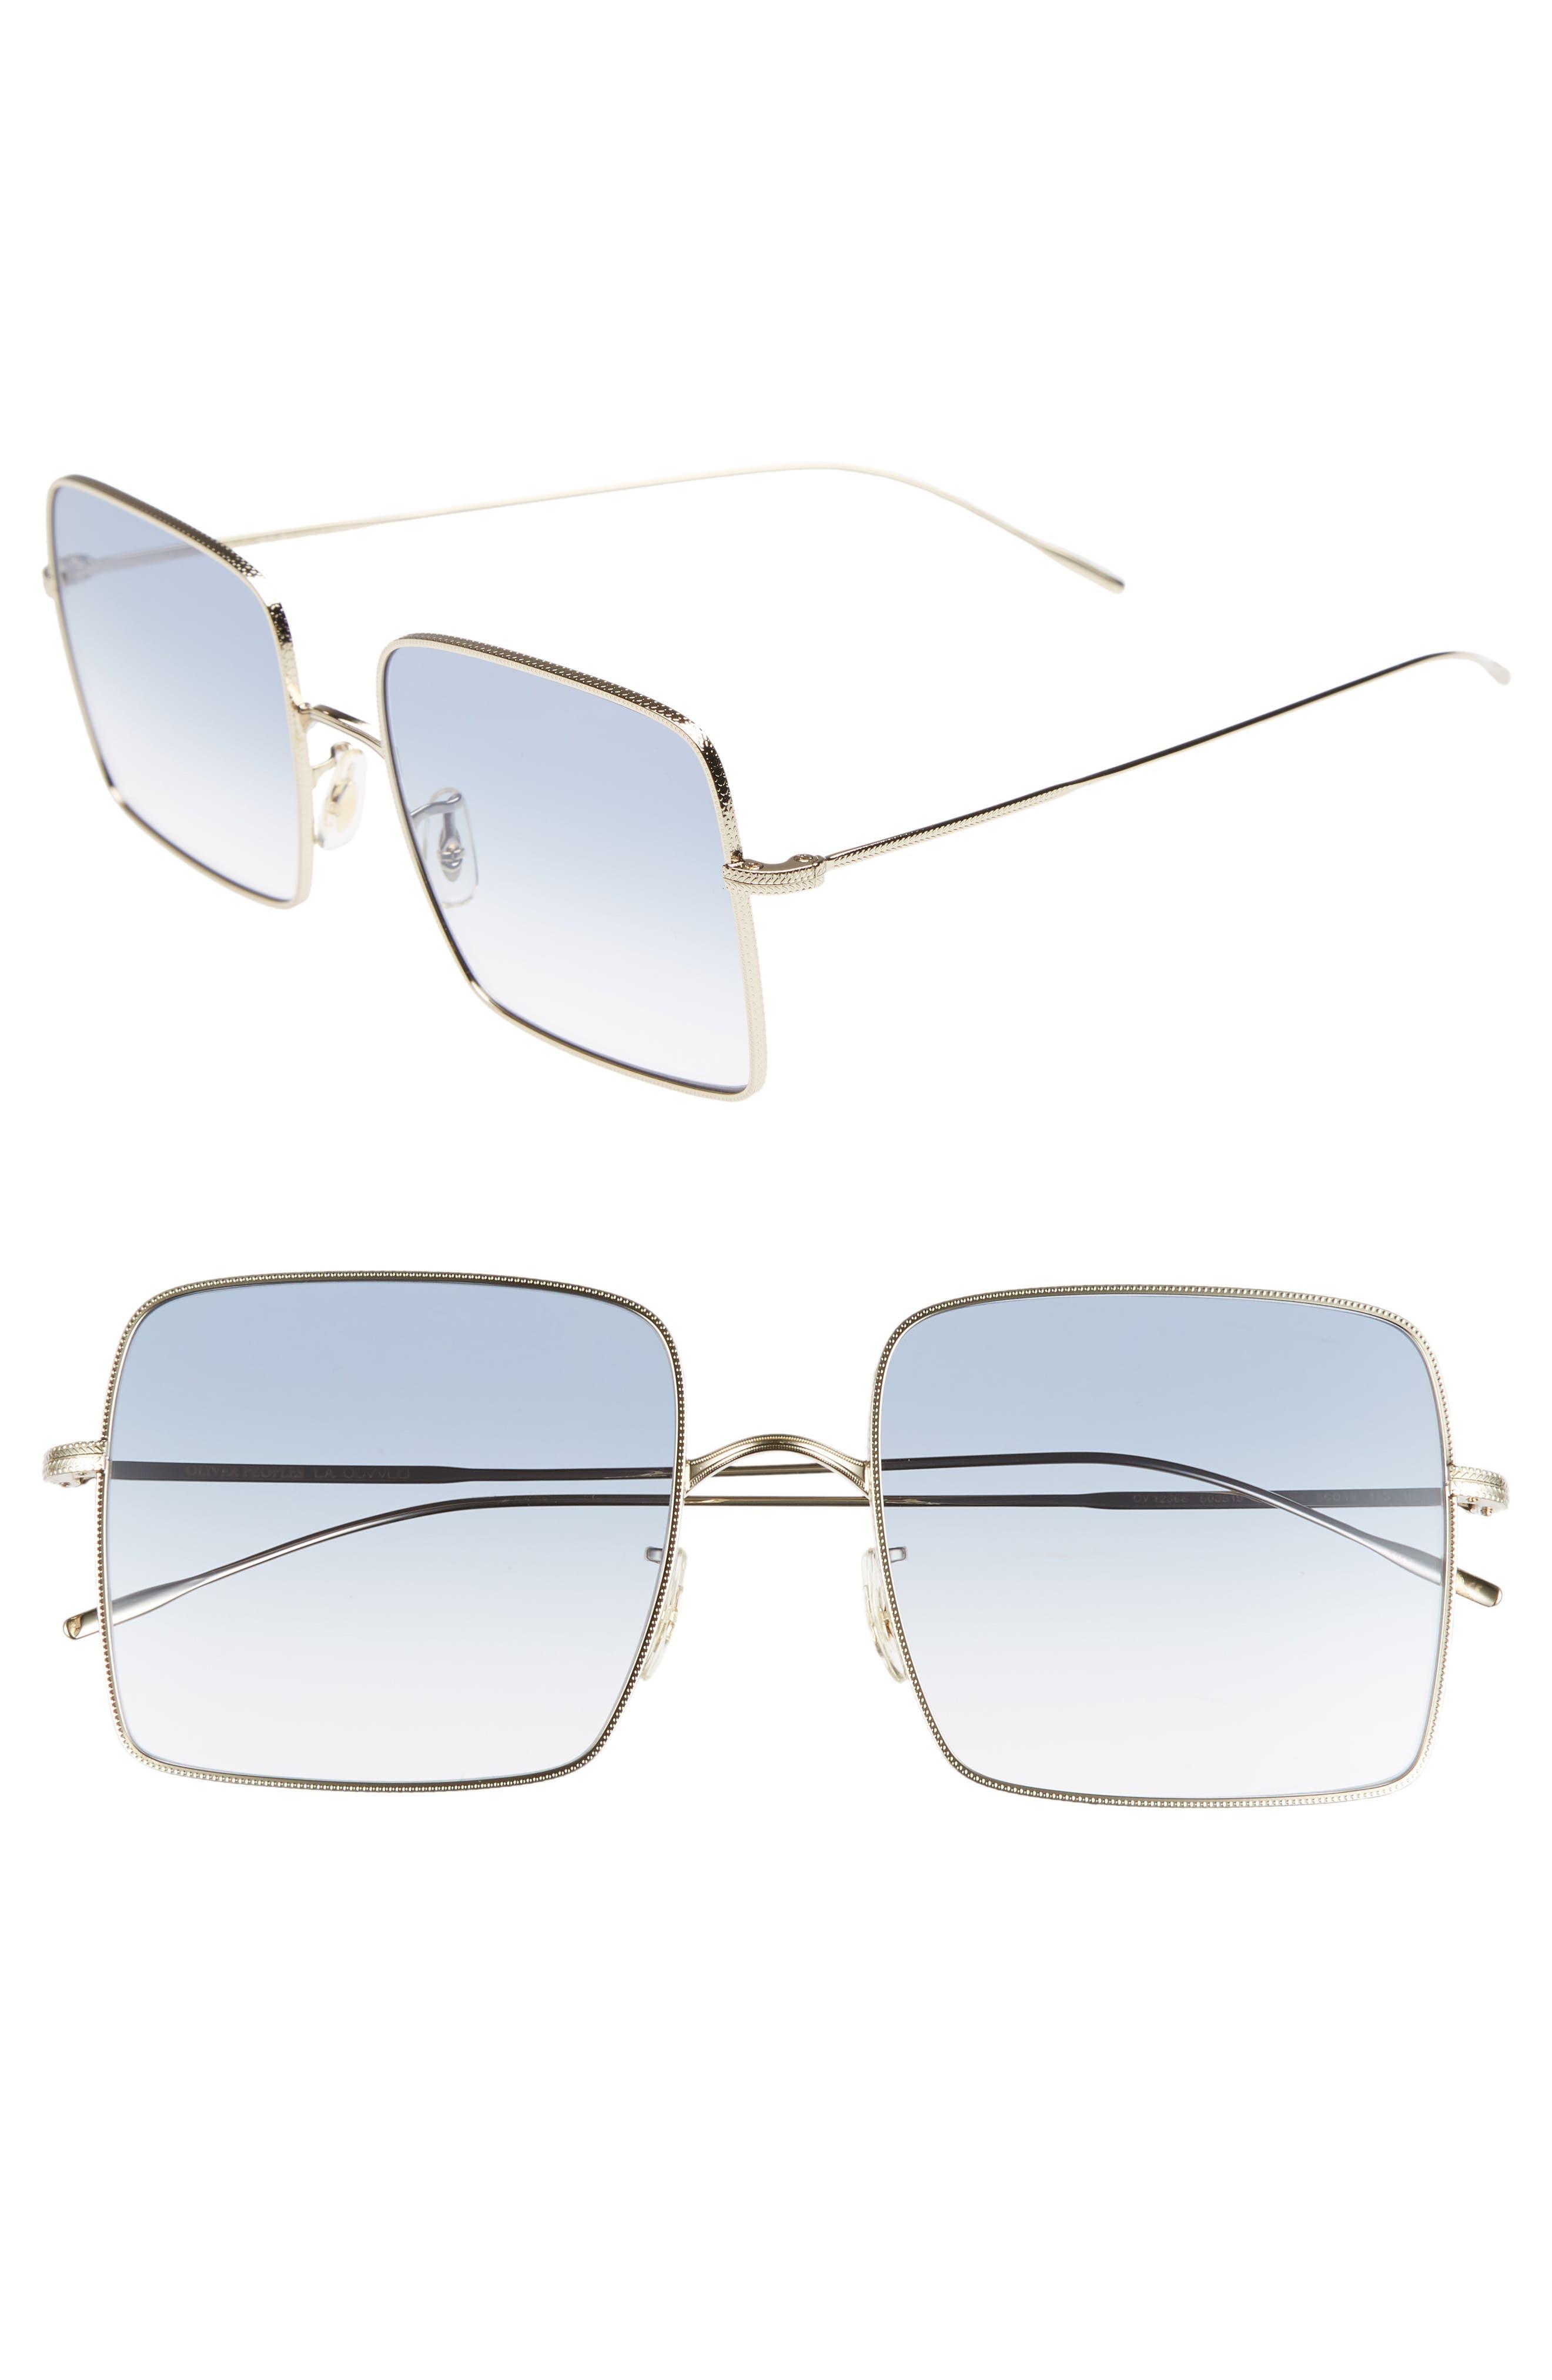 Rassine 56mm Sunglasses,                             Main thumbnail 1, color,                             SOFT GOLD BLUE